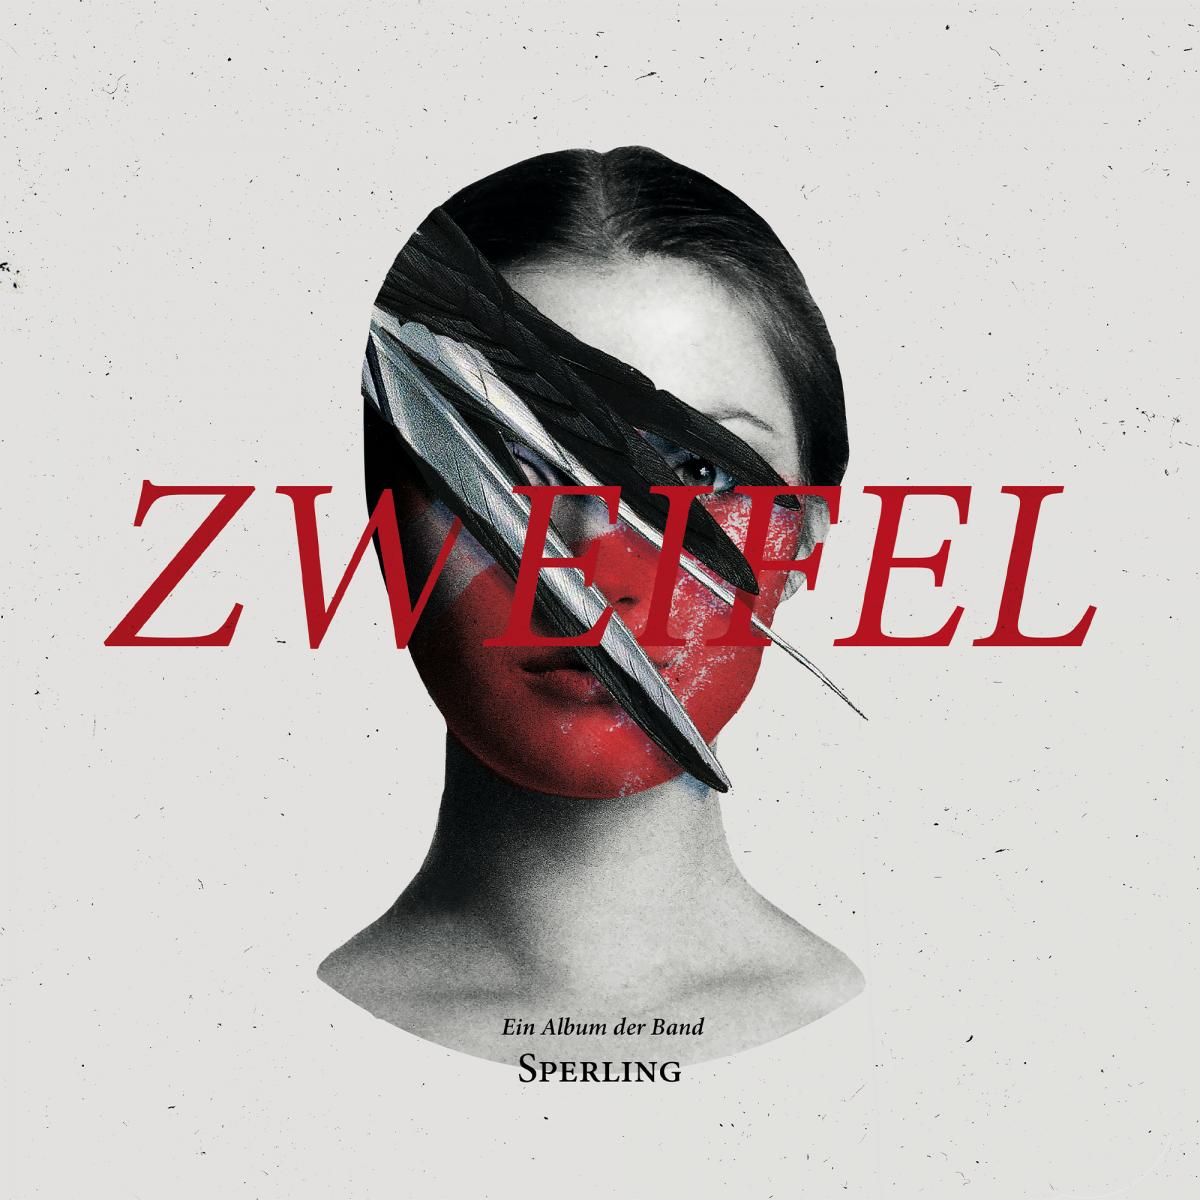 sperling-zweifel-album-review